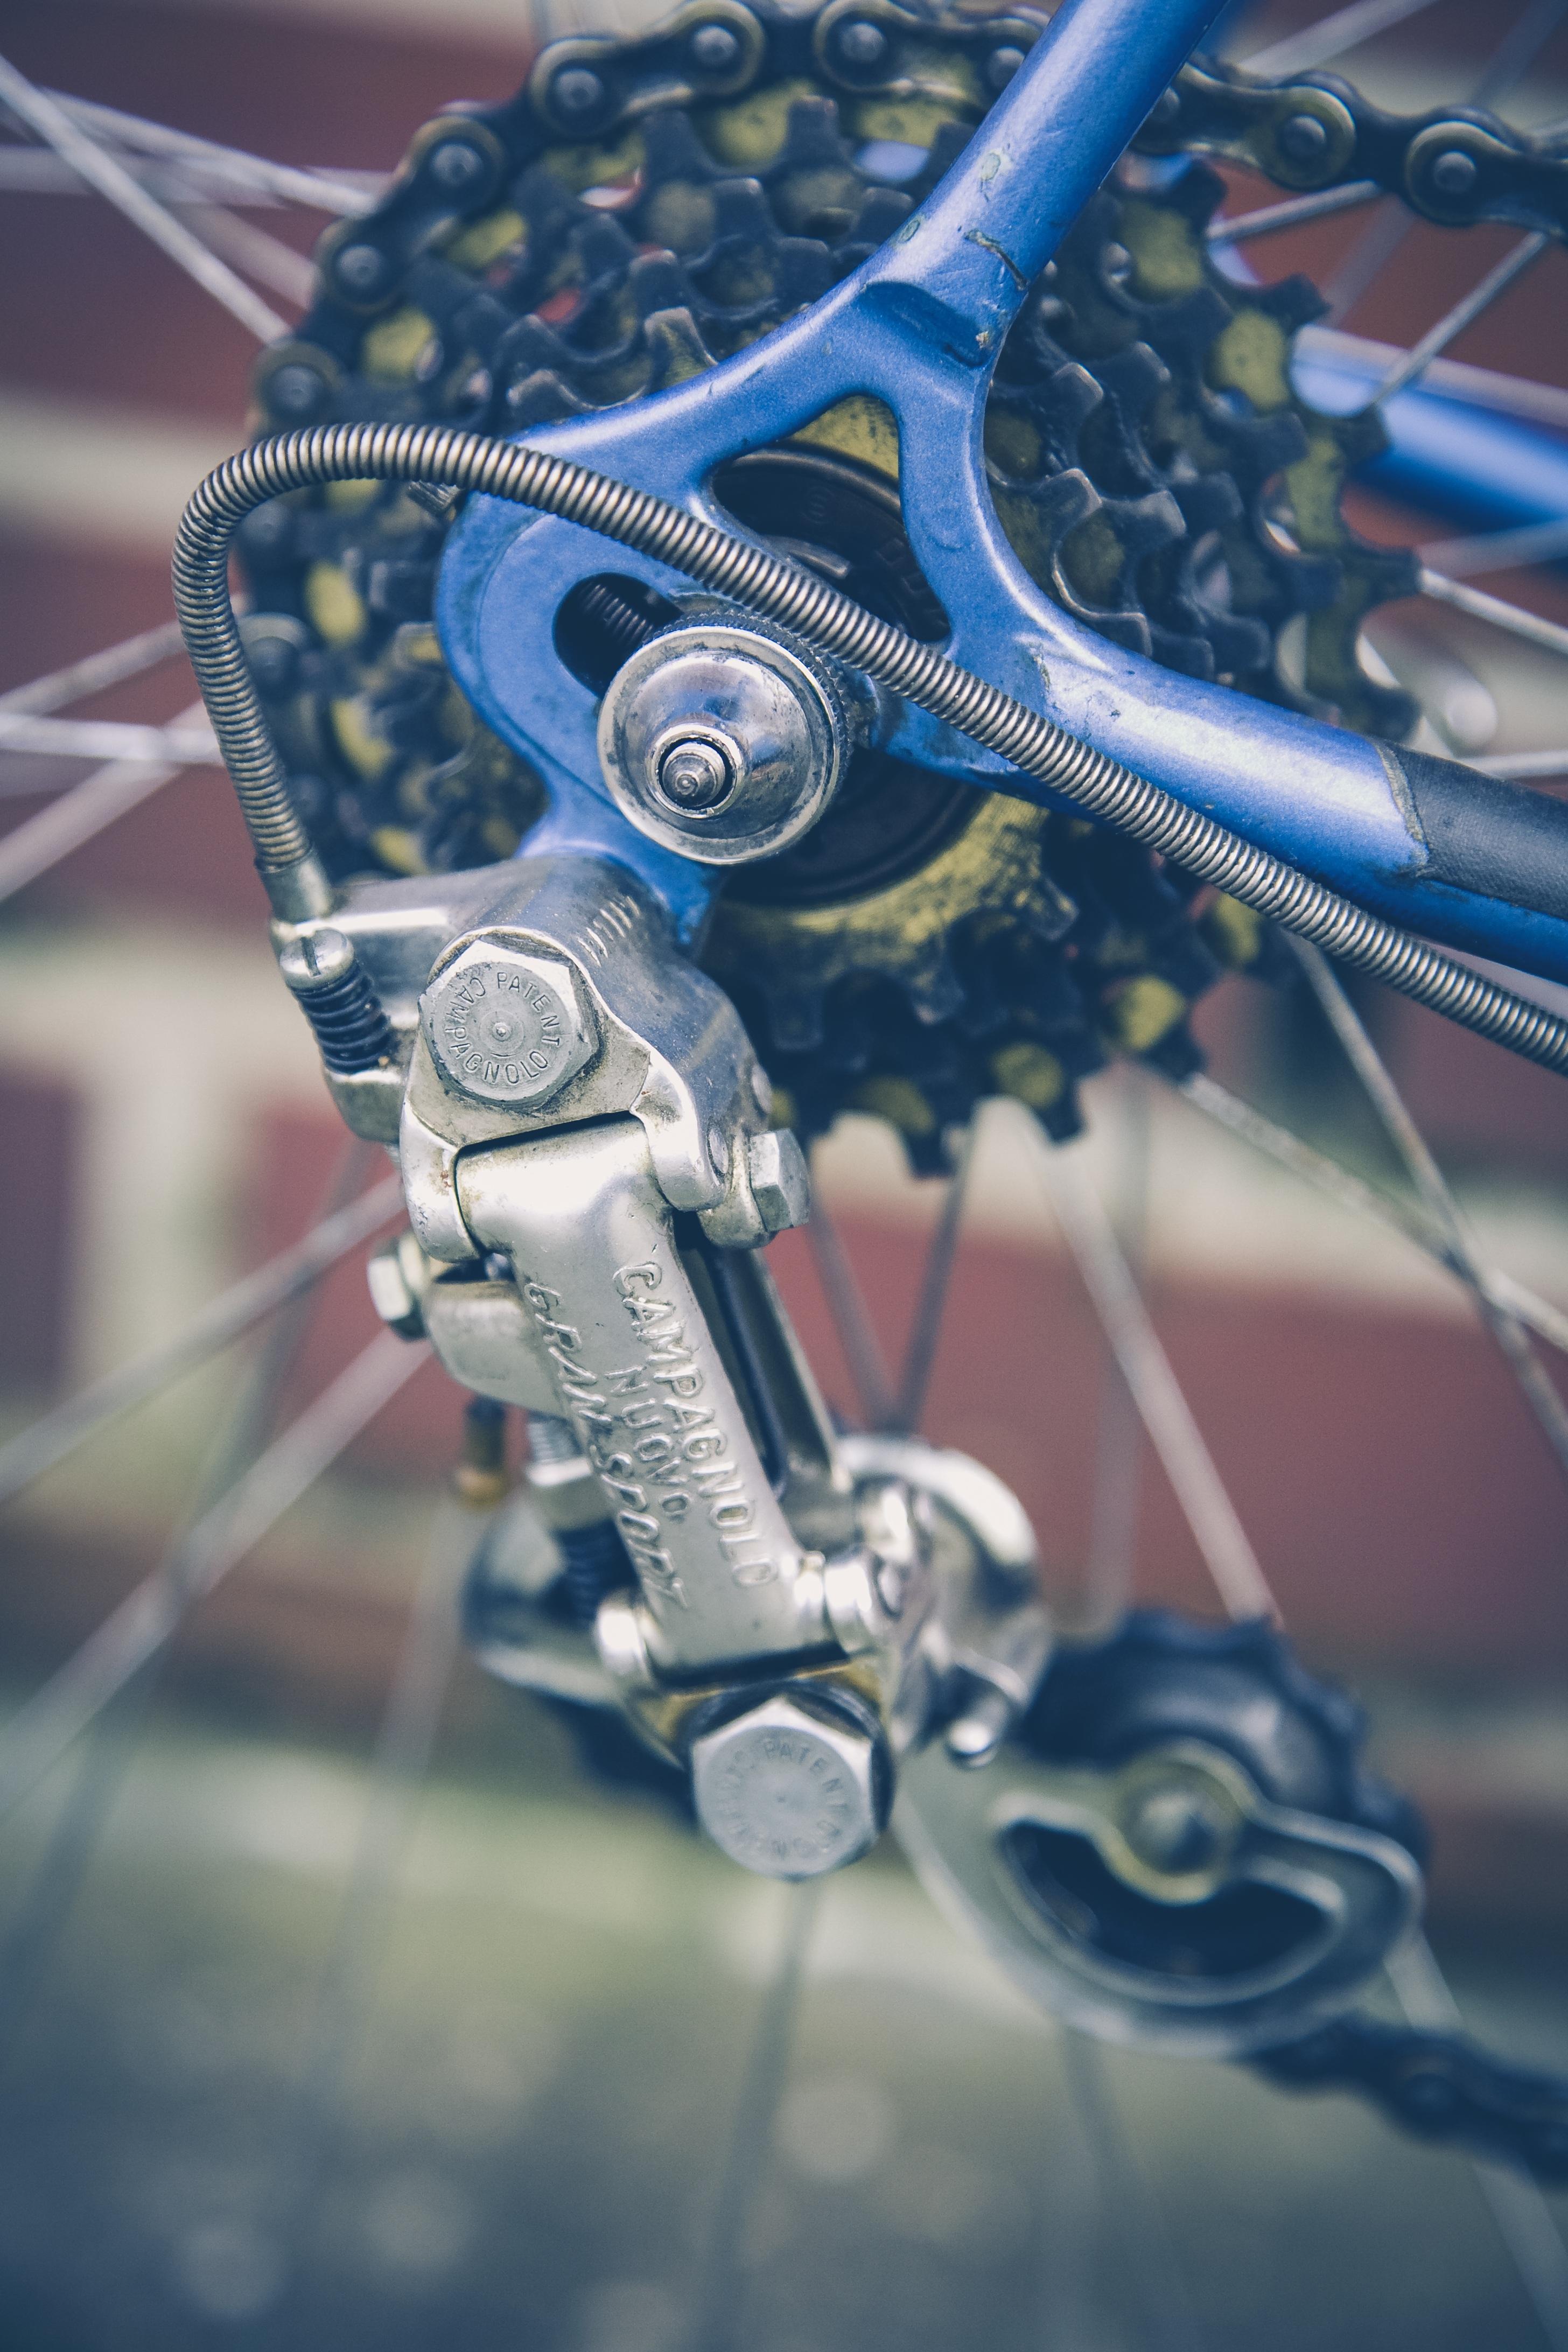 Kostenlose foto : Technologie, Jahrgang, Retro, Kette, Fahrrad ...